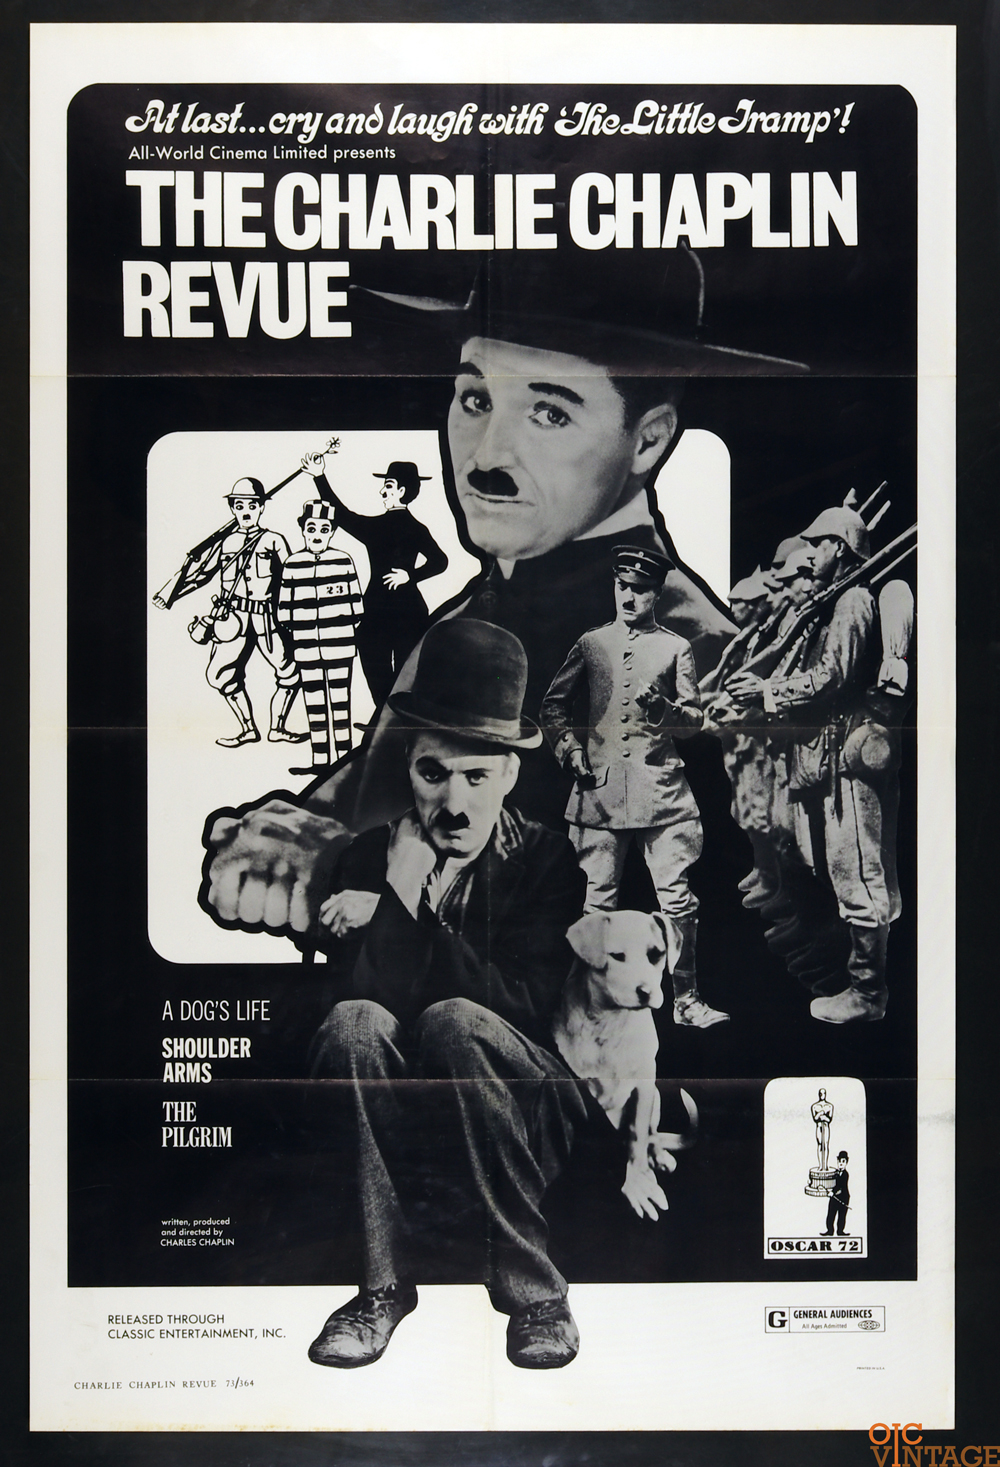 Charlie Chaplin Revue Movie Poster R1973 27x41 1 Sheet